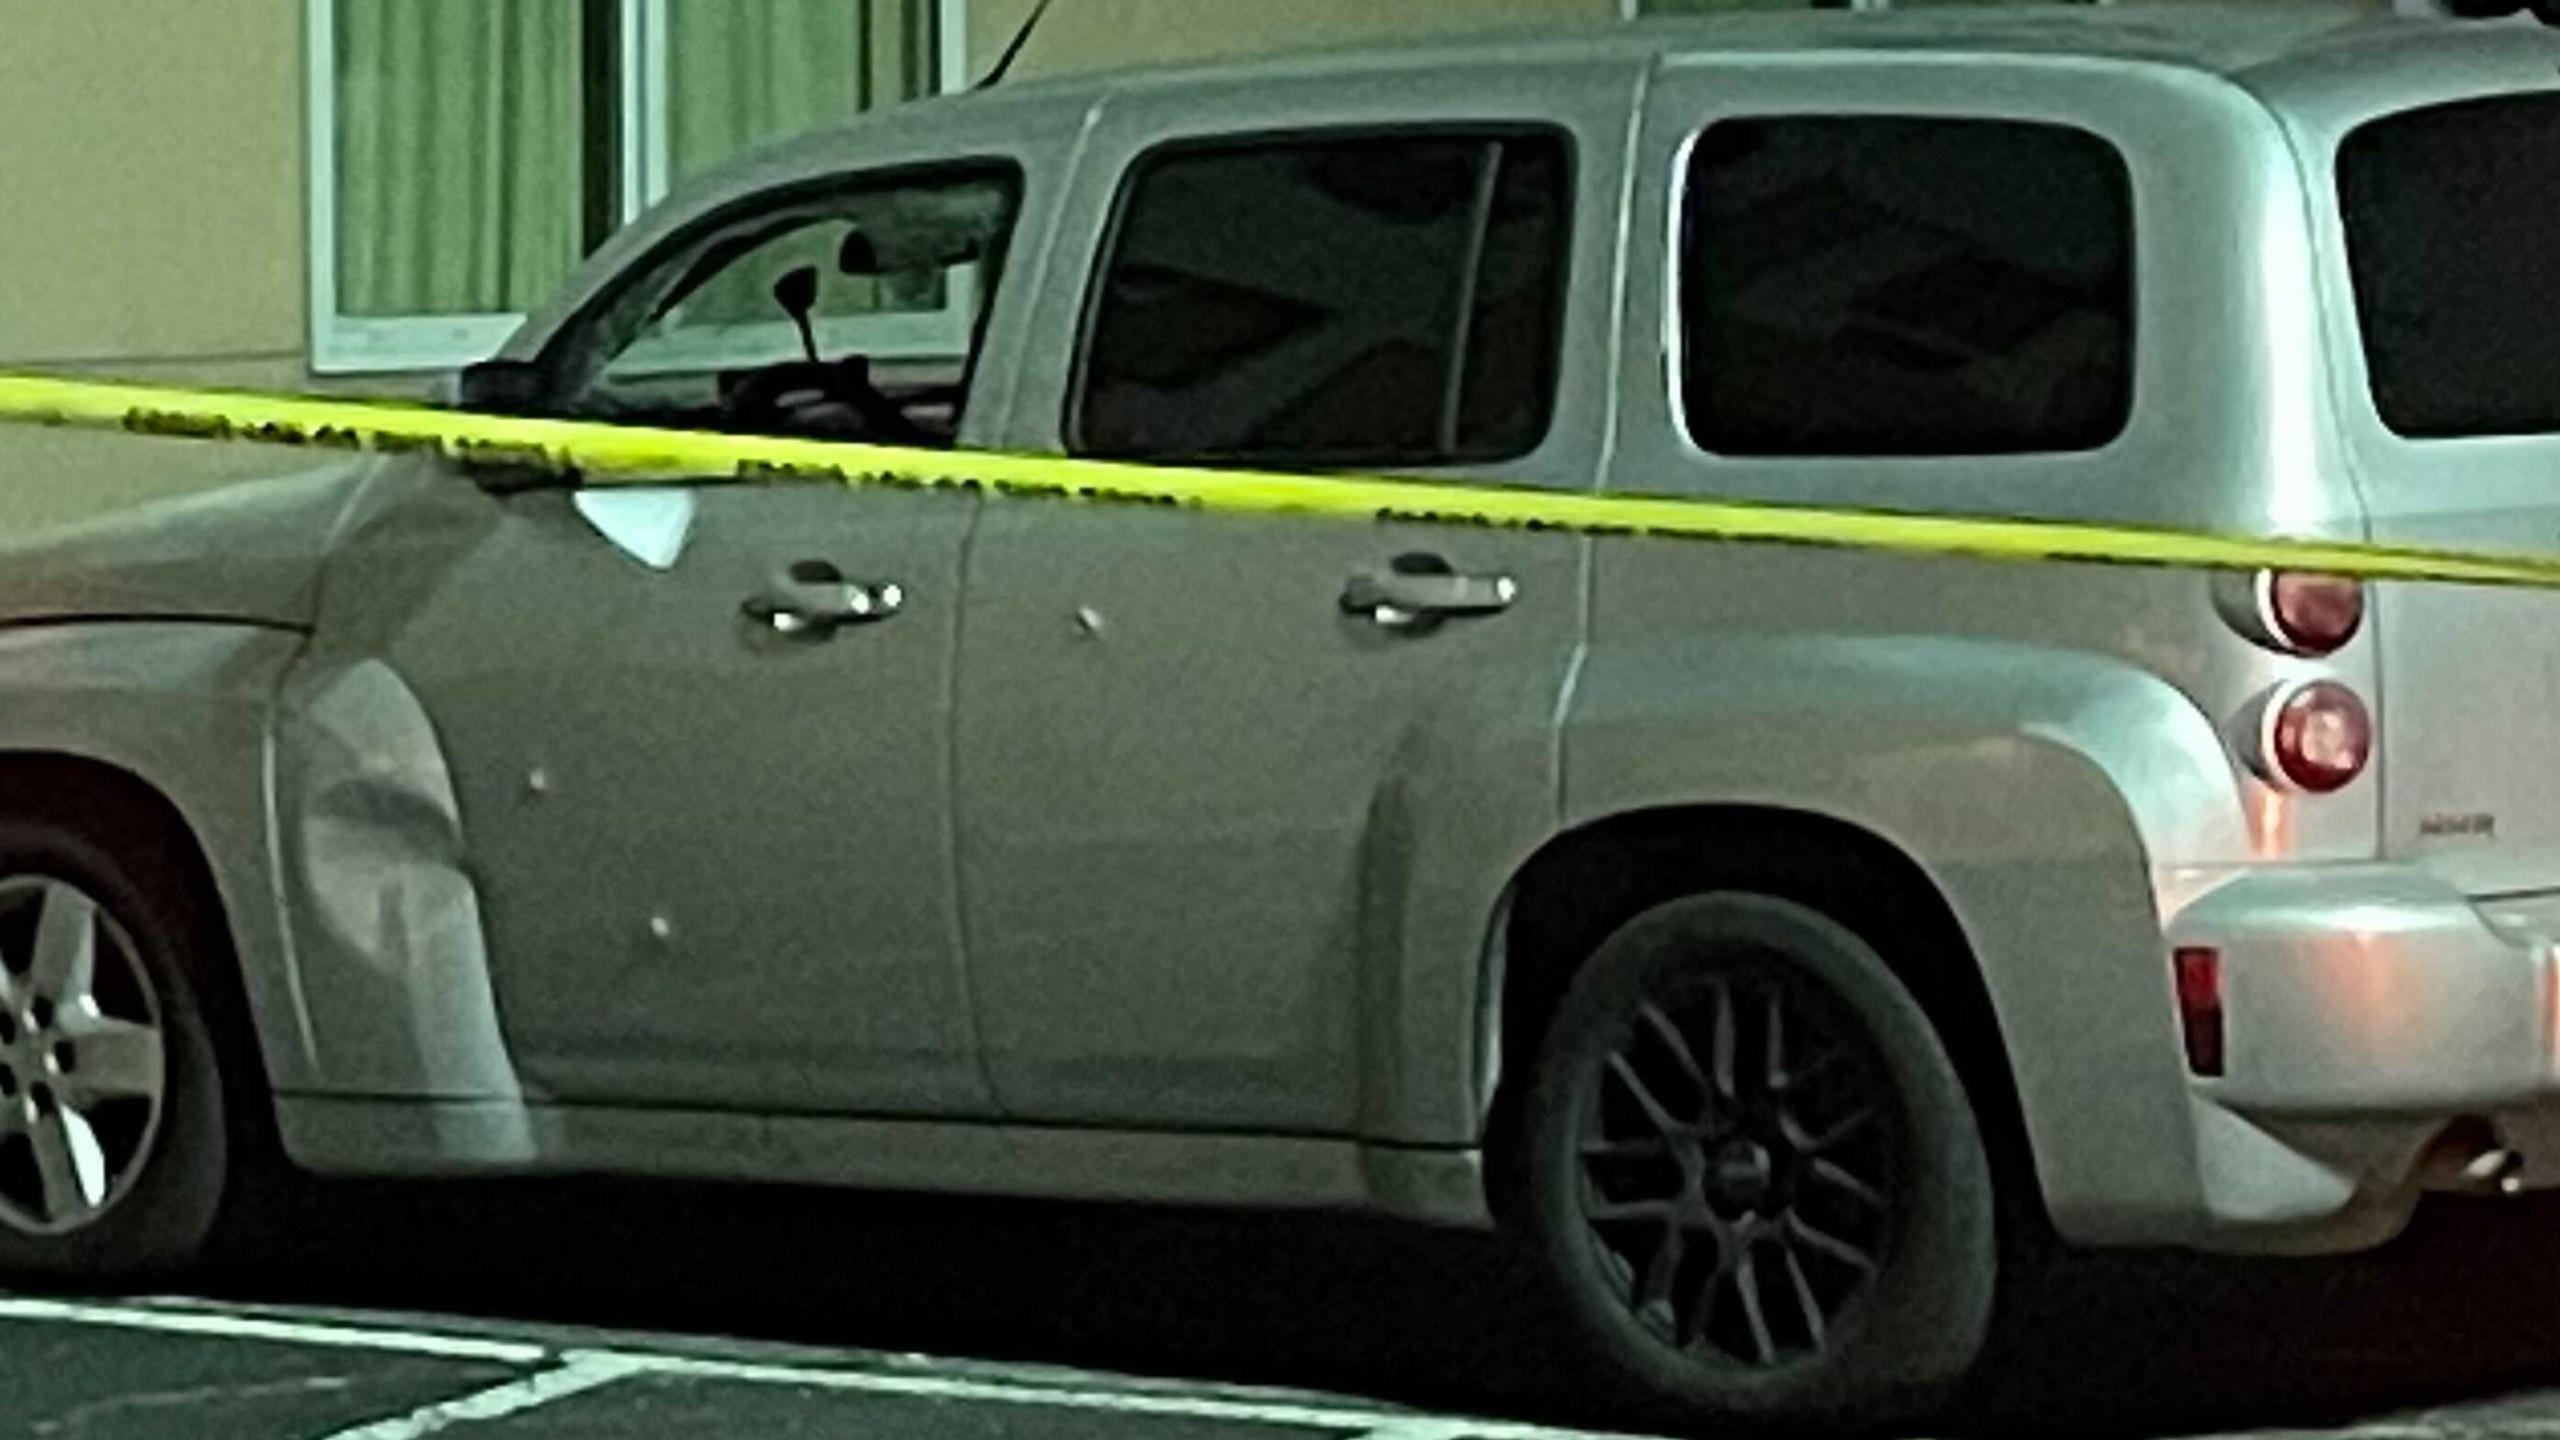 Southeast Austin Car Shooting